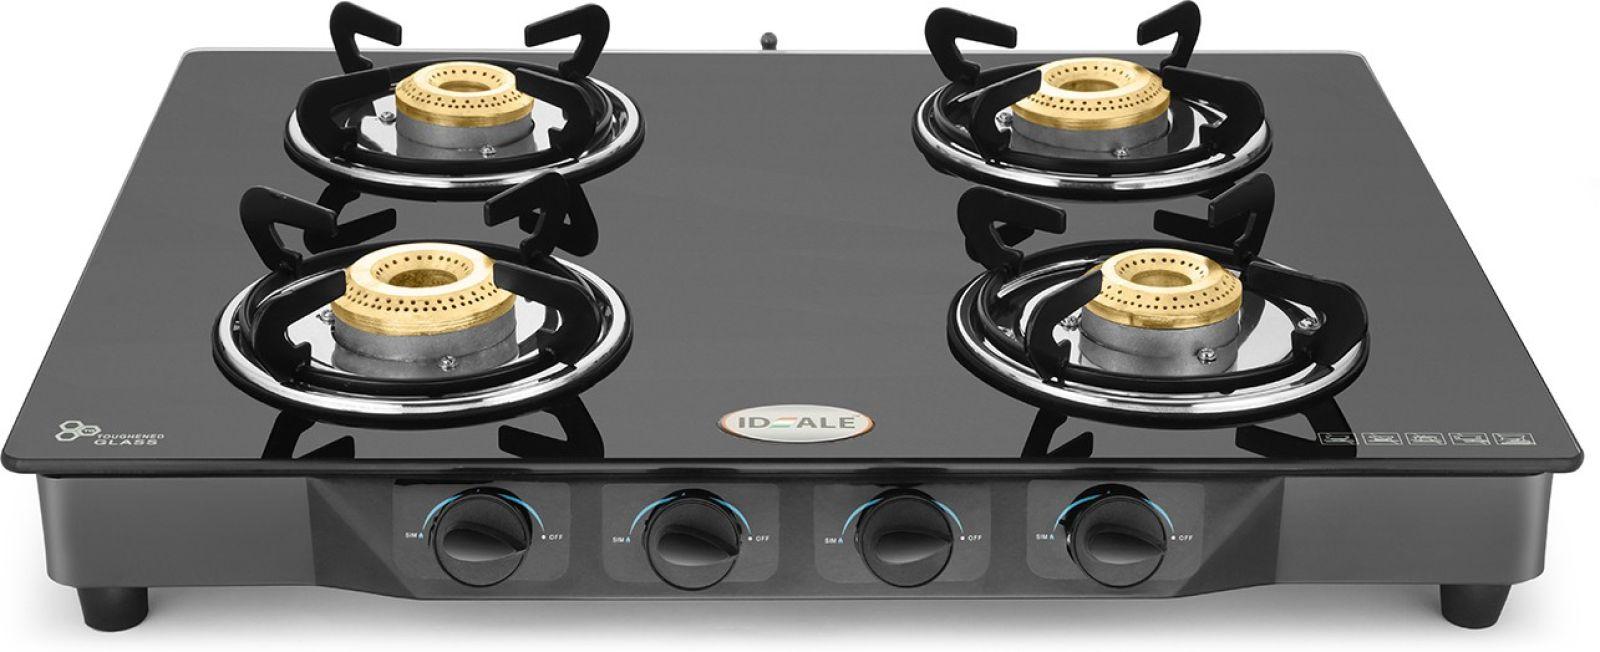 Ideale Quatre Steel Manual Gas Stove (4 Burners)